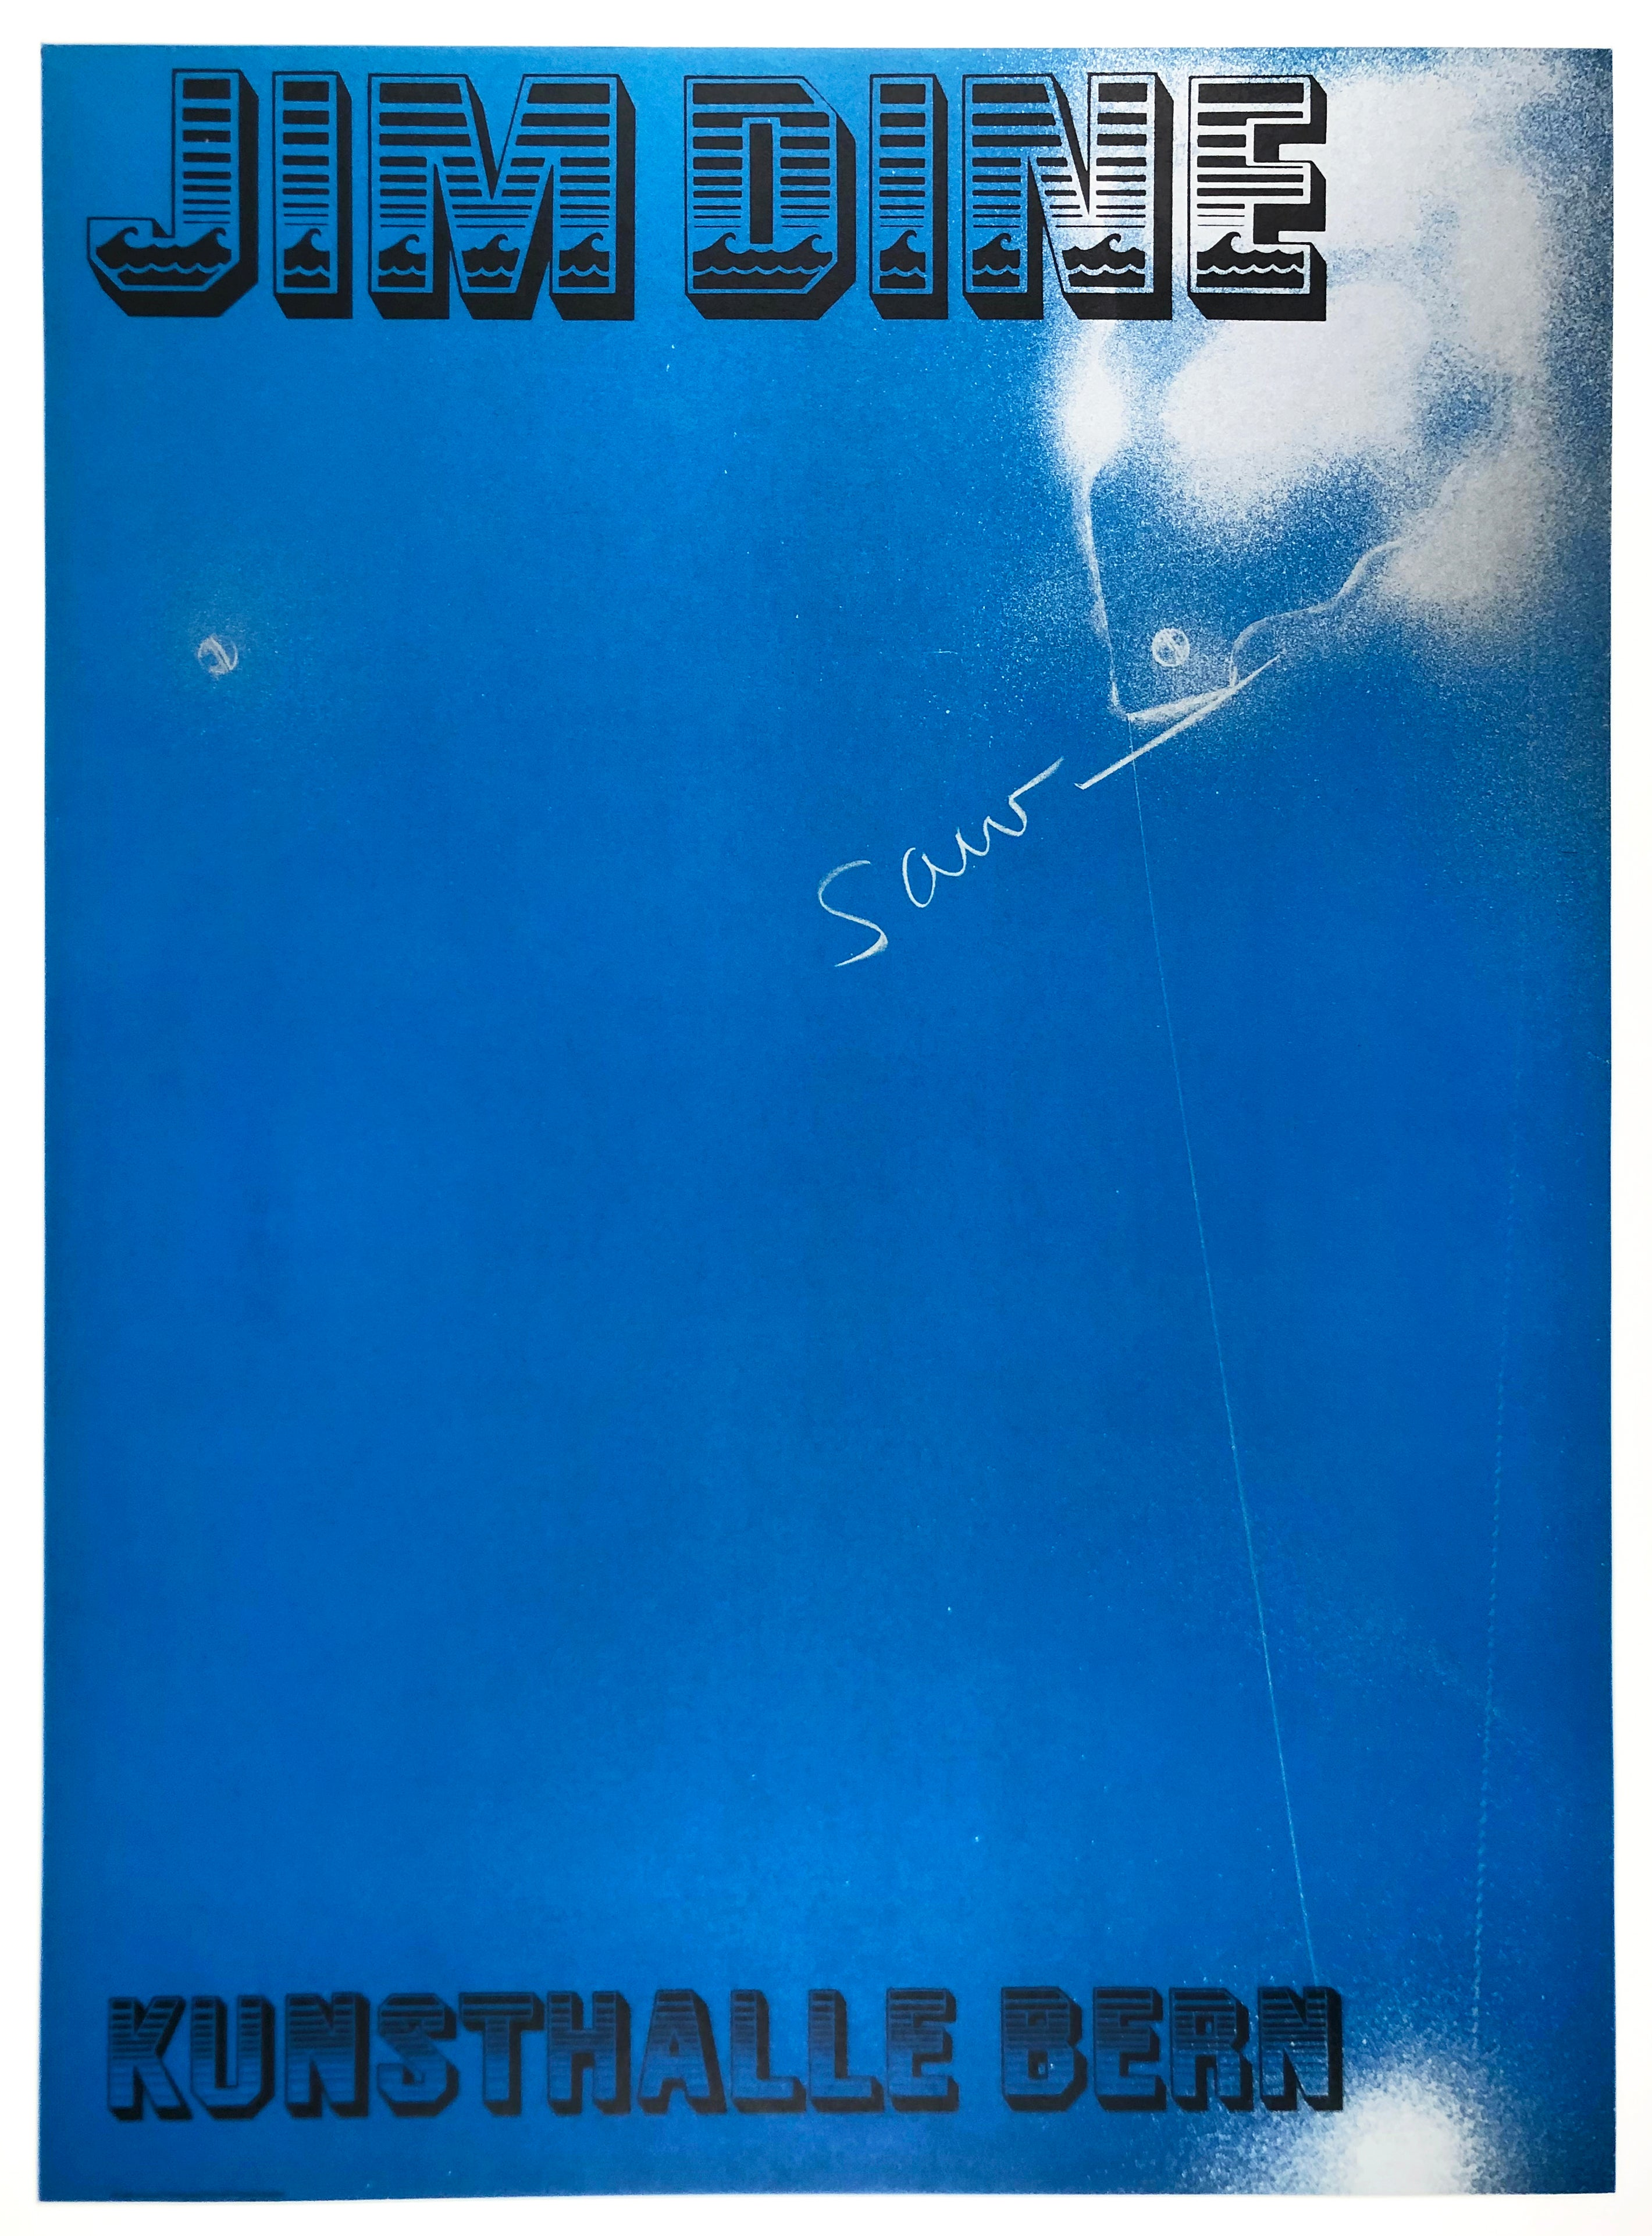 Vintage Jim Dine tool poster Kunsthalle Bern (Saw) neon blue 1970s retro font